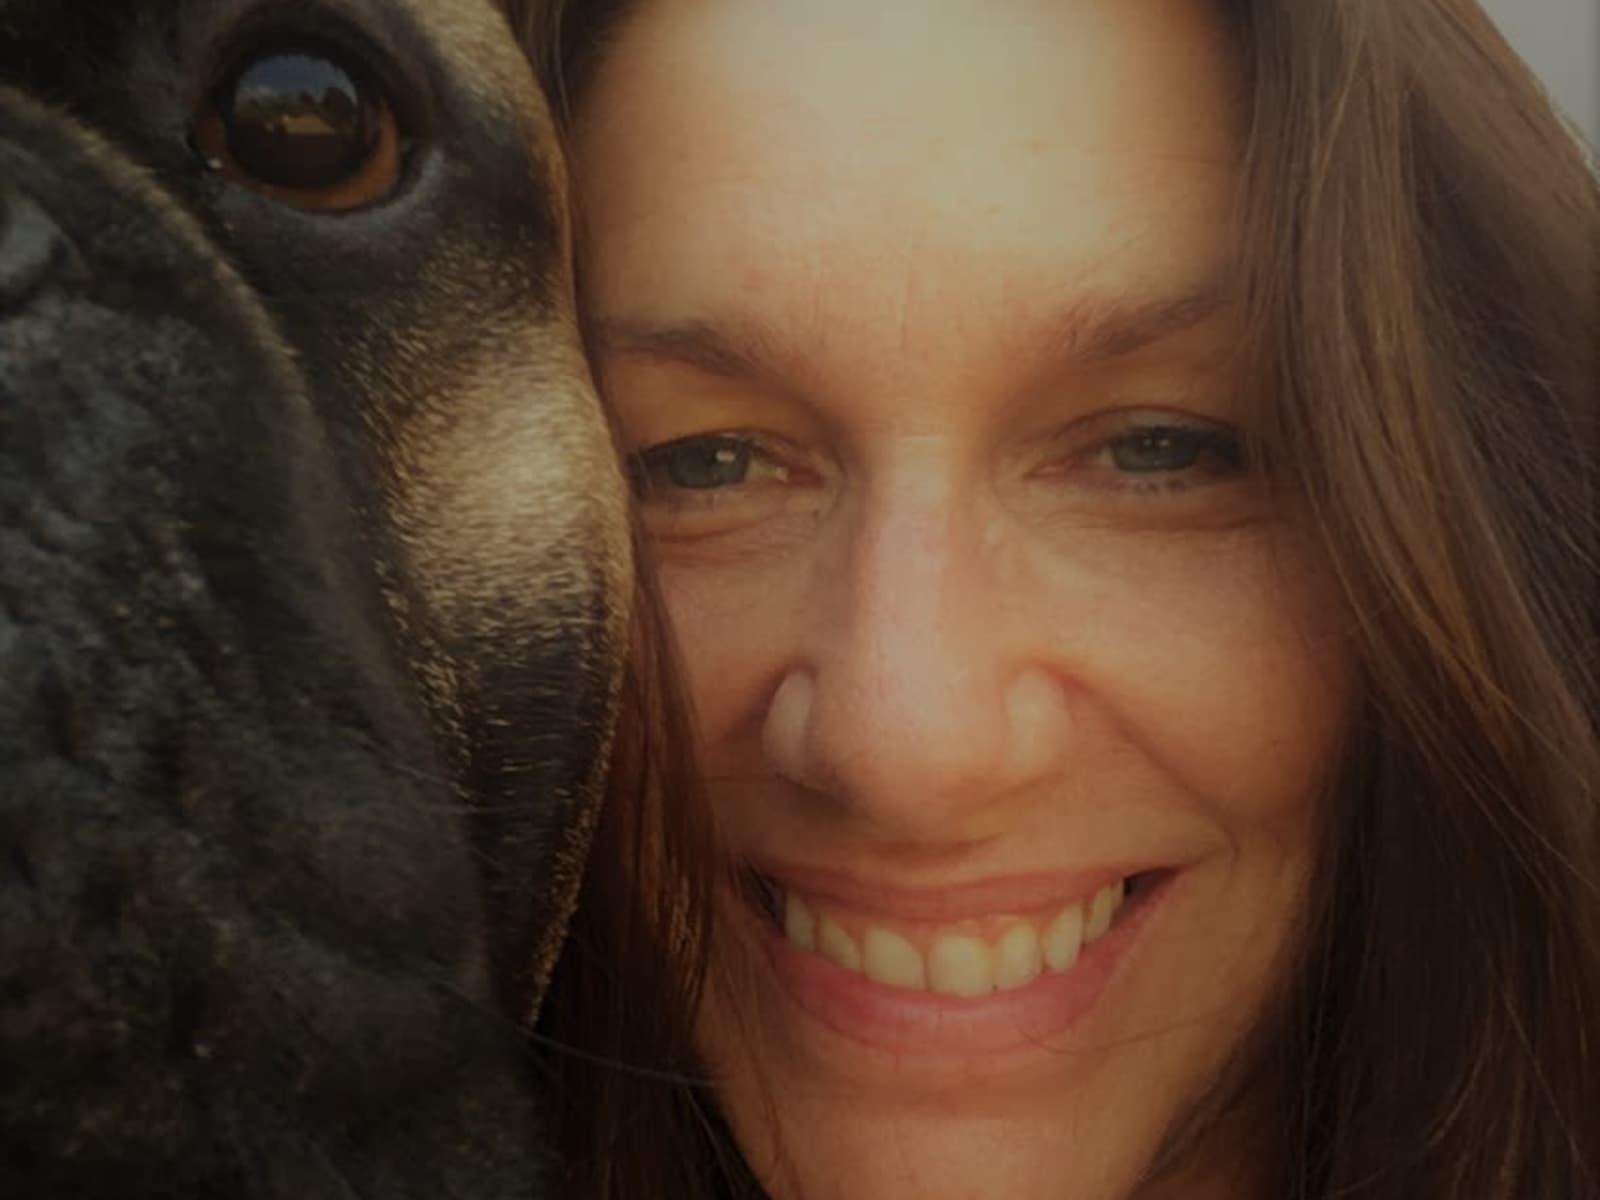 Alexandra from Charlottesville, Virginia, United States